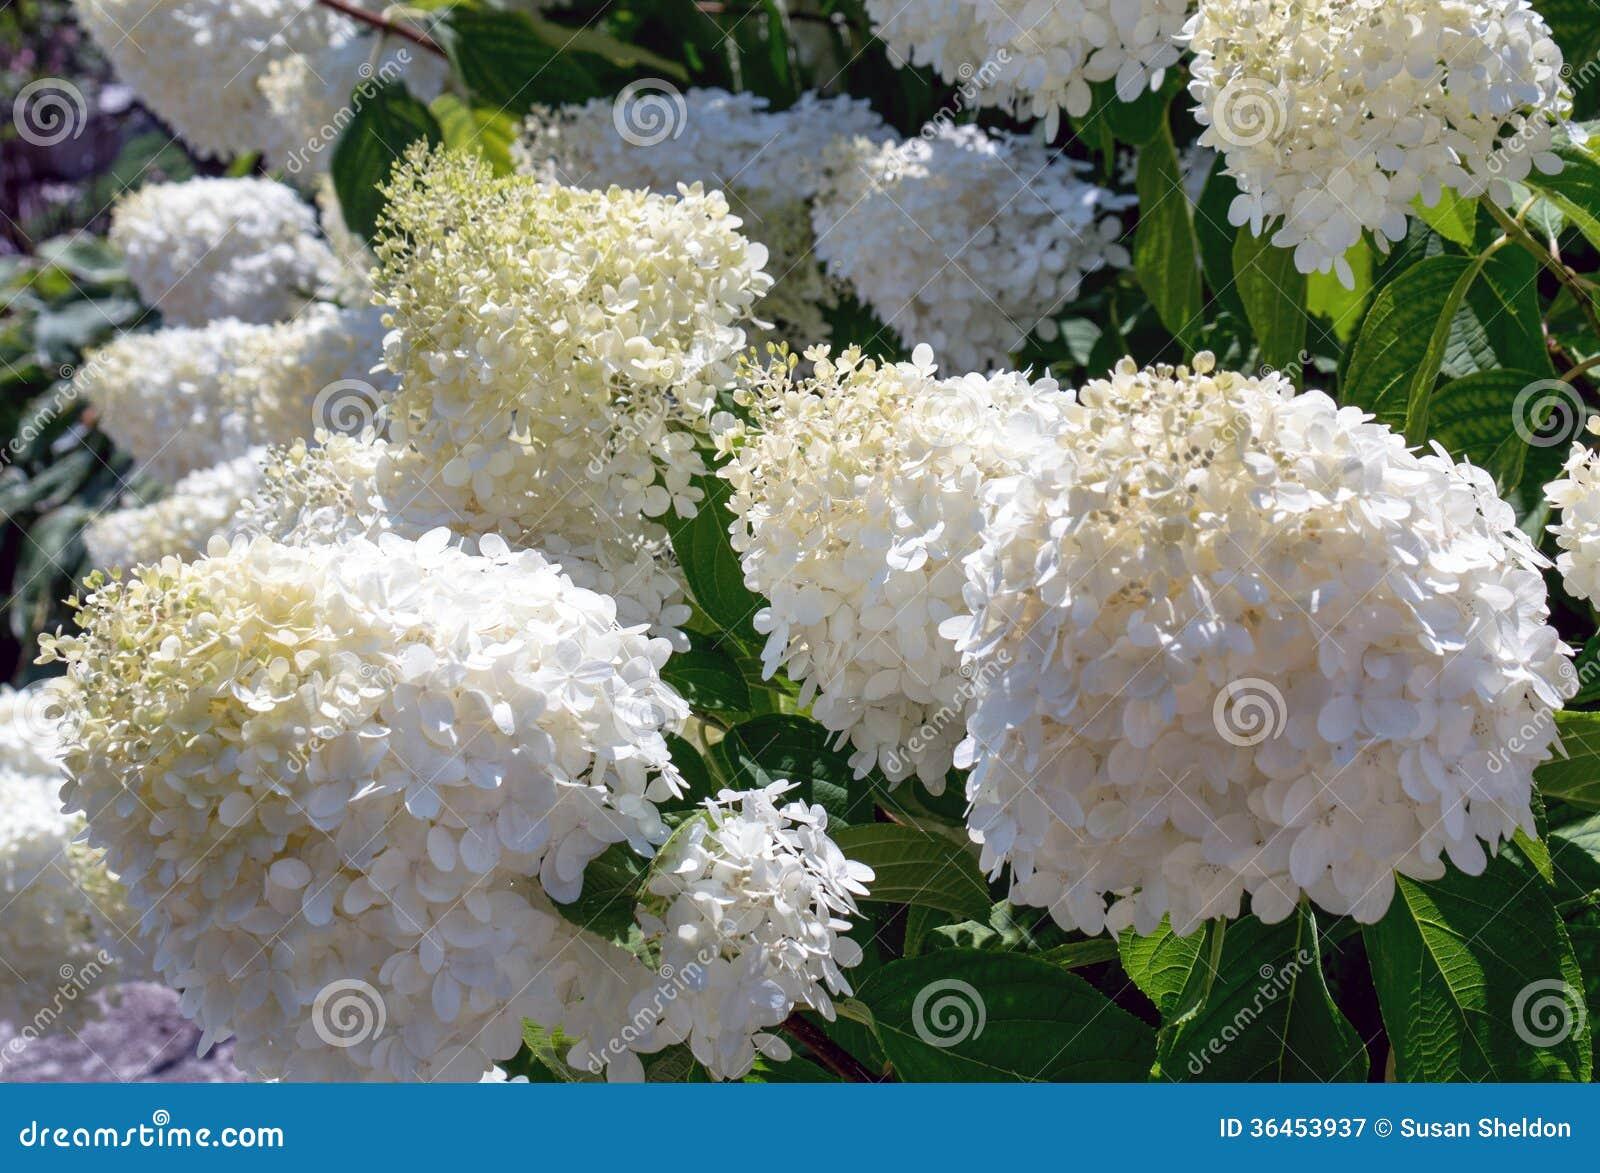 White pom pom flowers stock image image of white balls 36453937 white pom pom flowers mightylinksfo